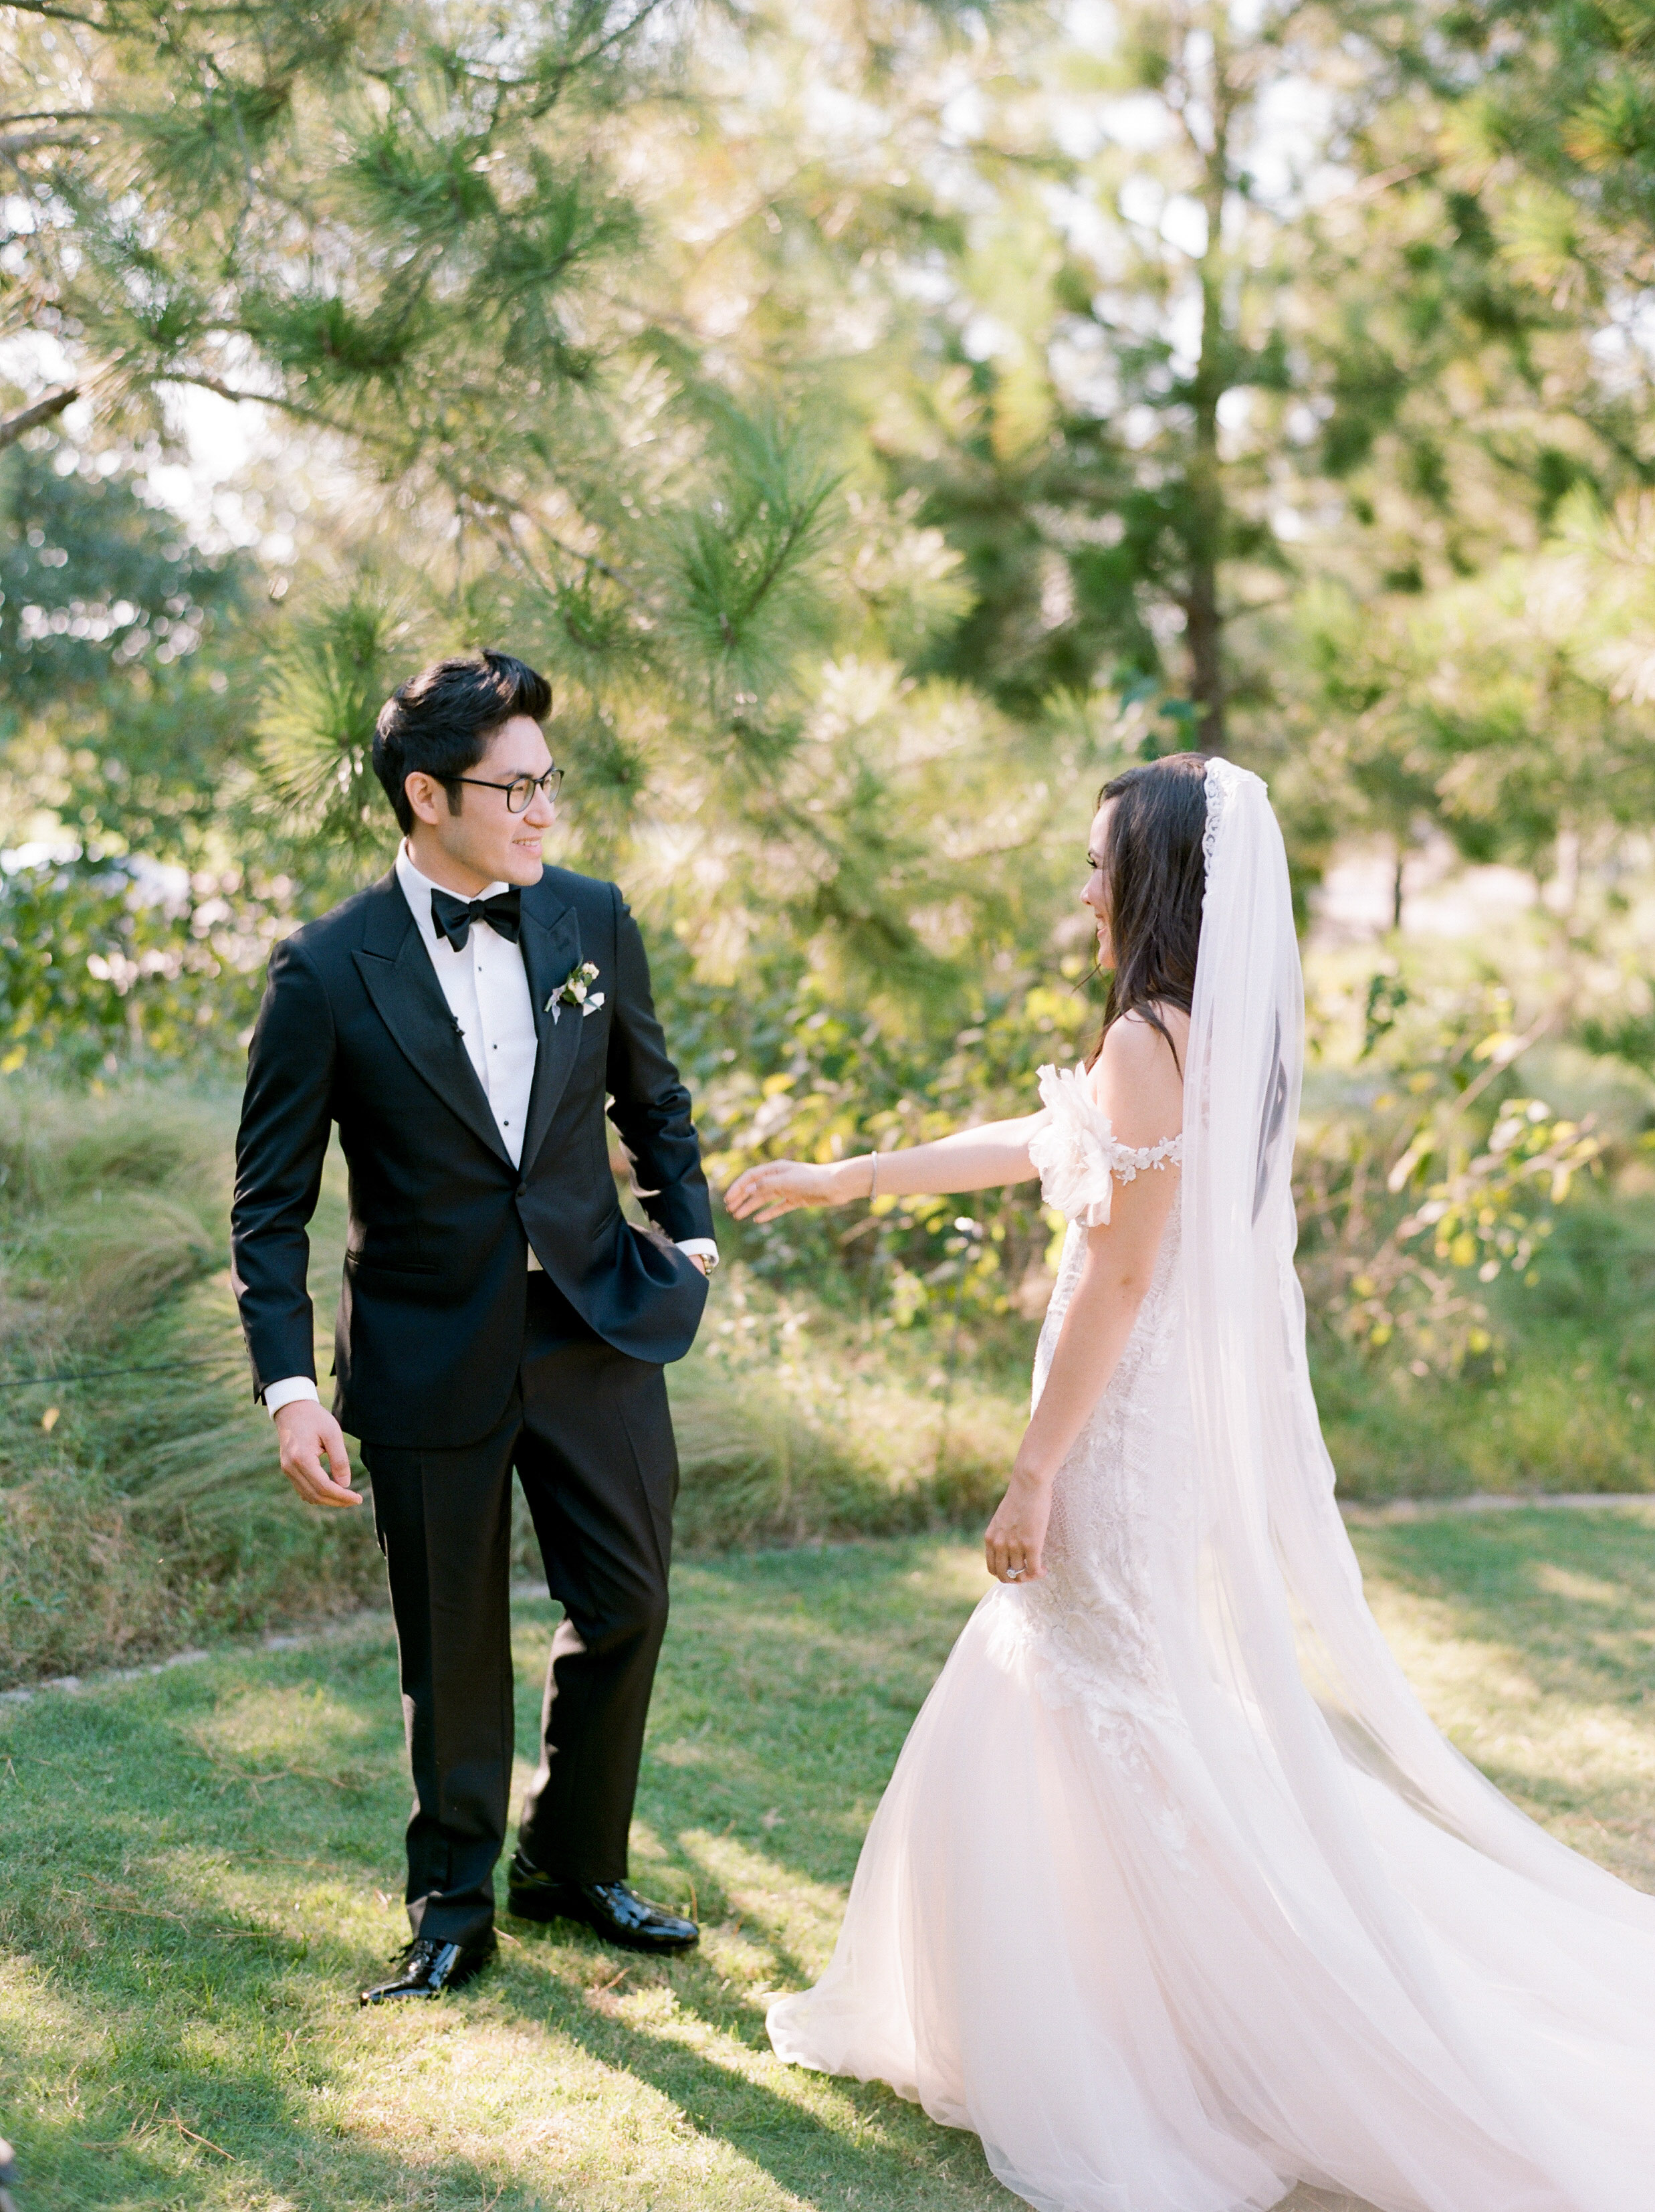 Martha-Stewart-Wedding-Dana-Fernandez-Photography-Josh-Texas-Film-Houston-Wedding-Fine-Art-Photographer-McGovern-Centennial-Gardens-Top-Best-161.jpg